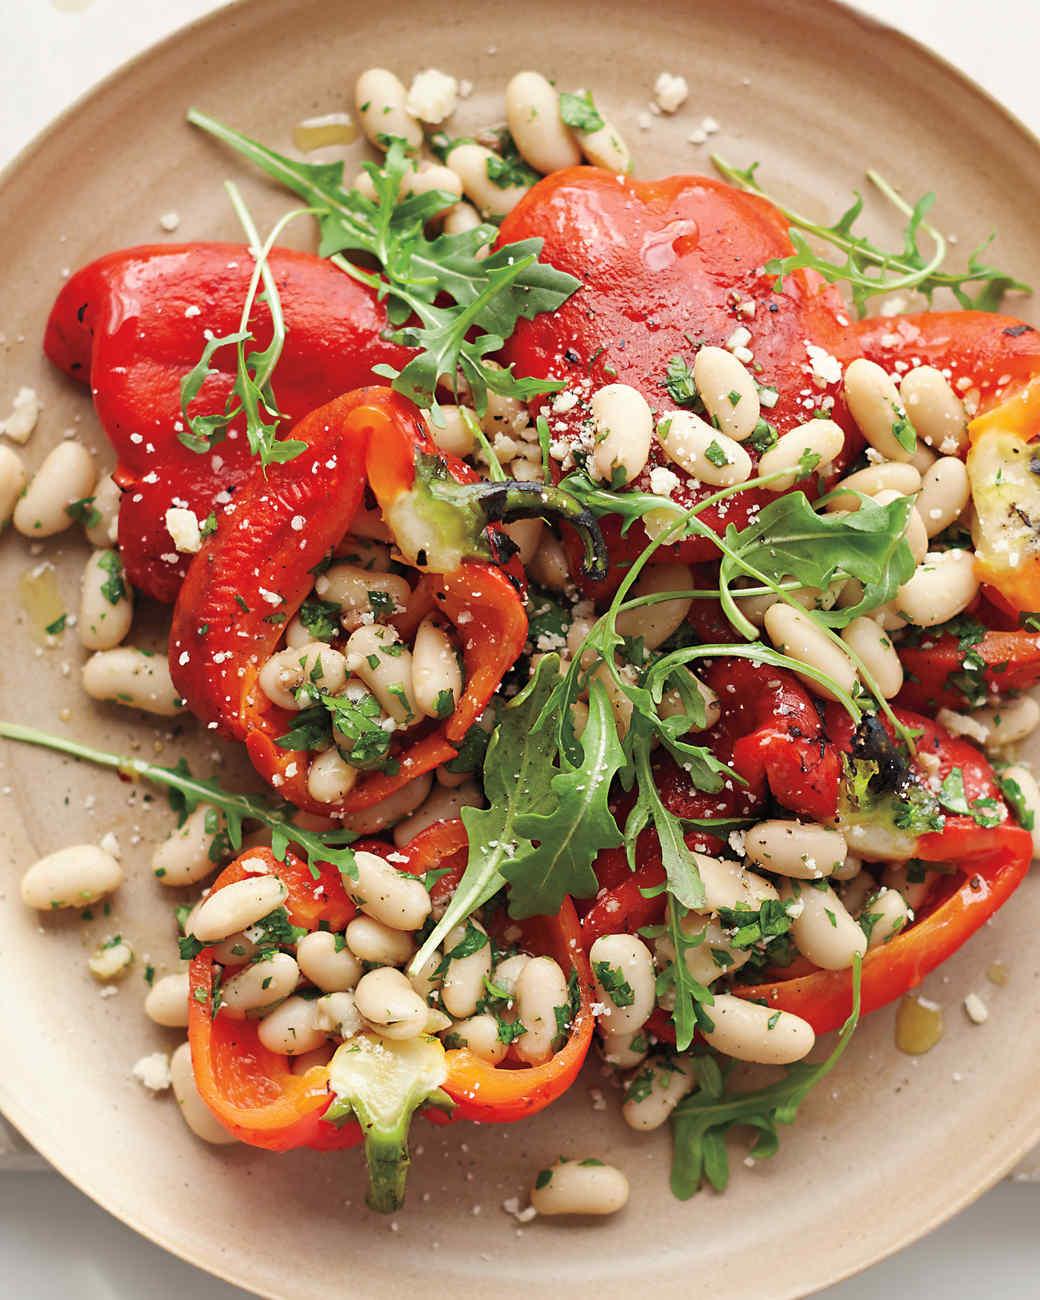 red-pepper-salad-200-mld109979.jpg